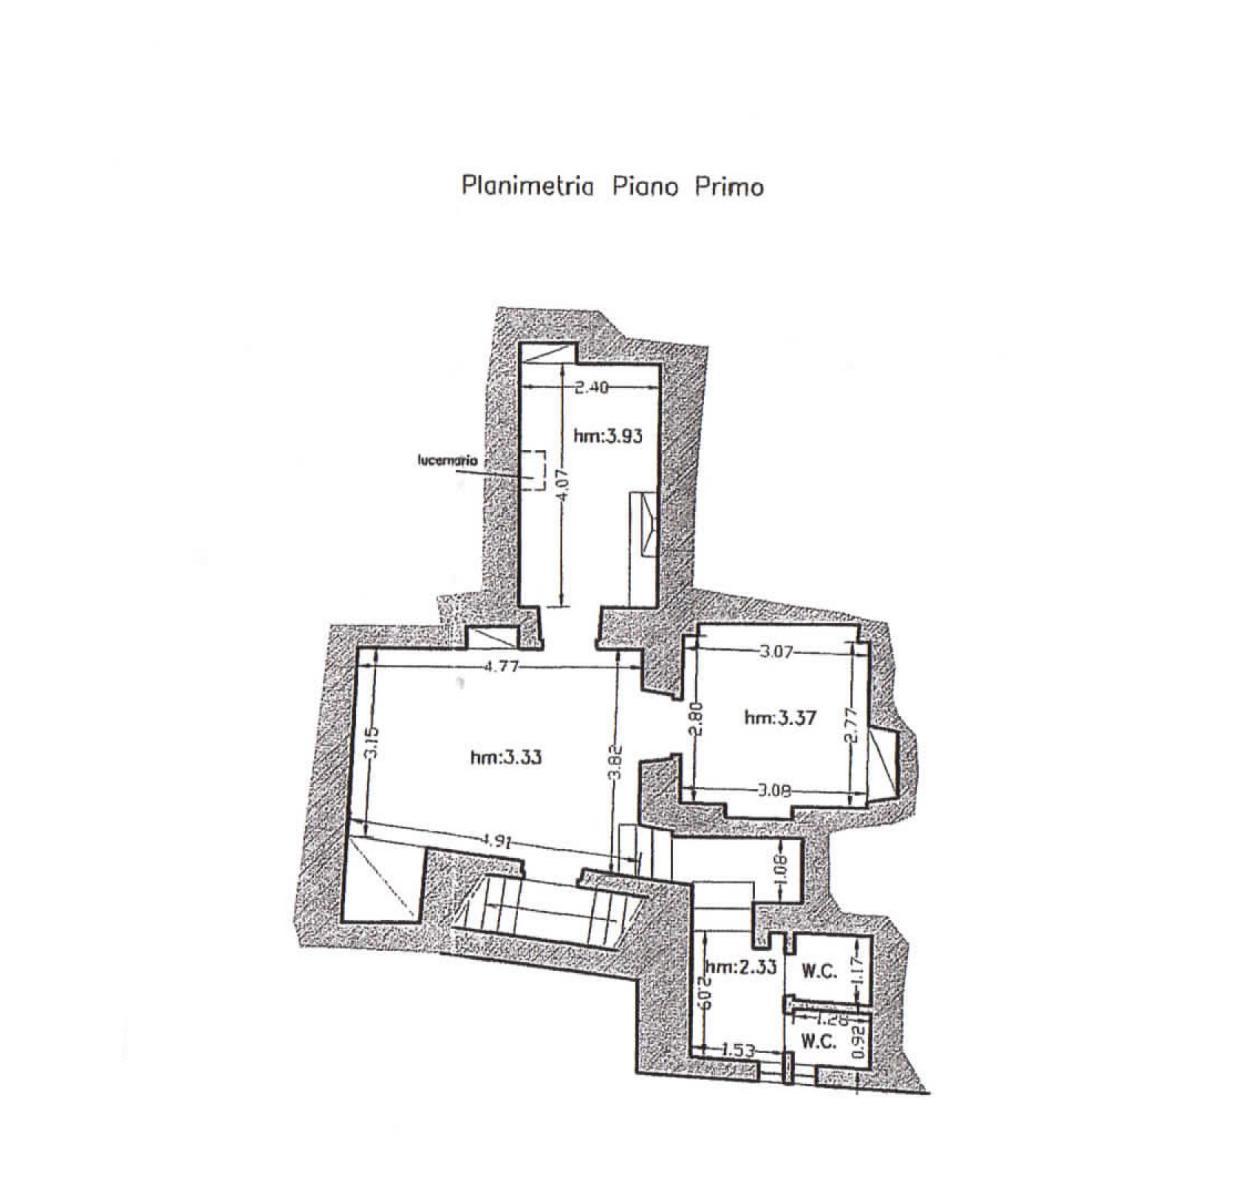 Vendita Centro storico – Via Mele, Ceglie Messapica (Brindisi)